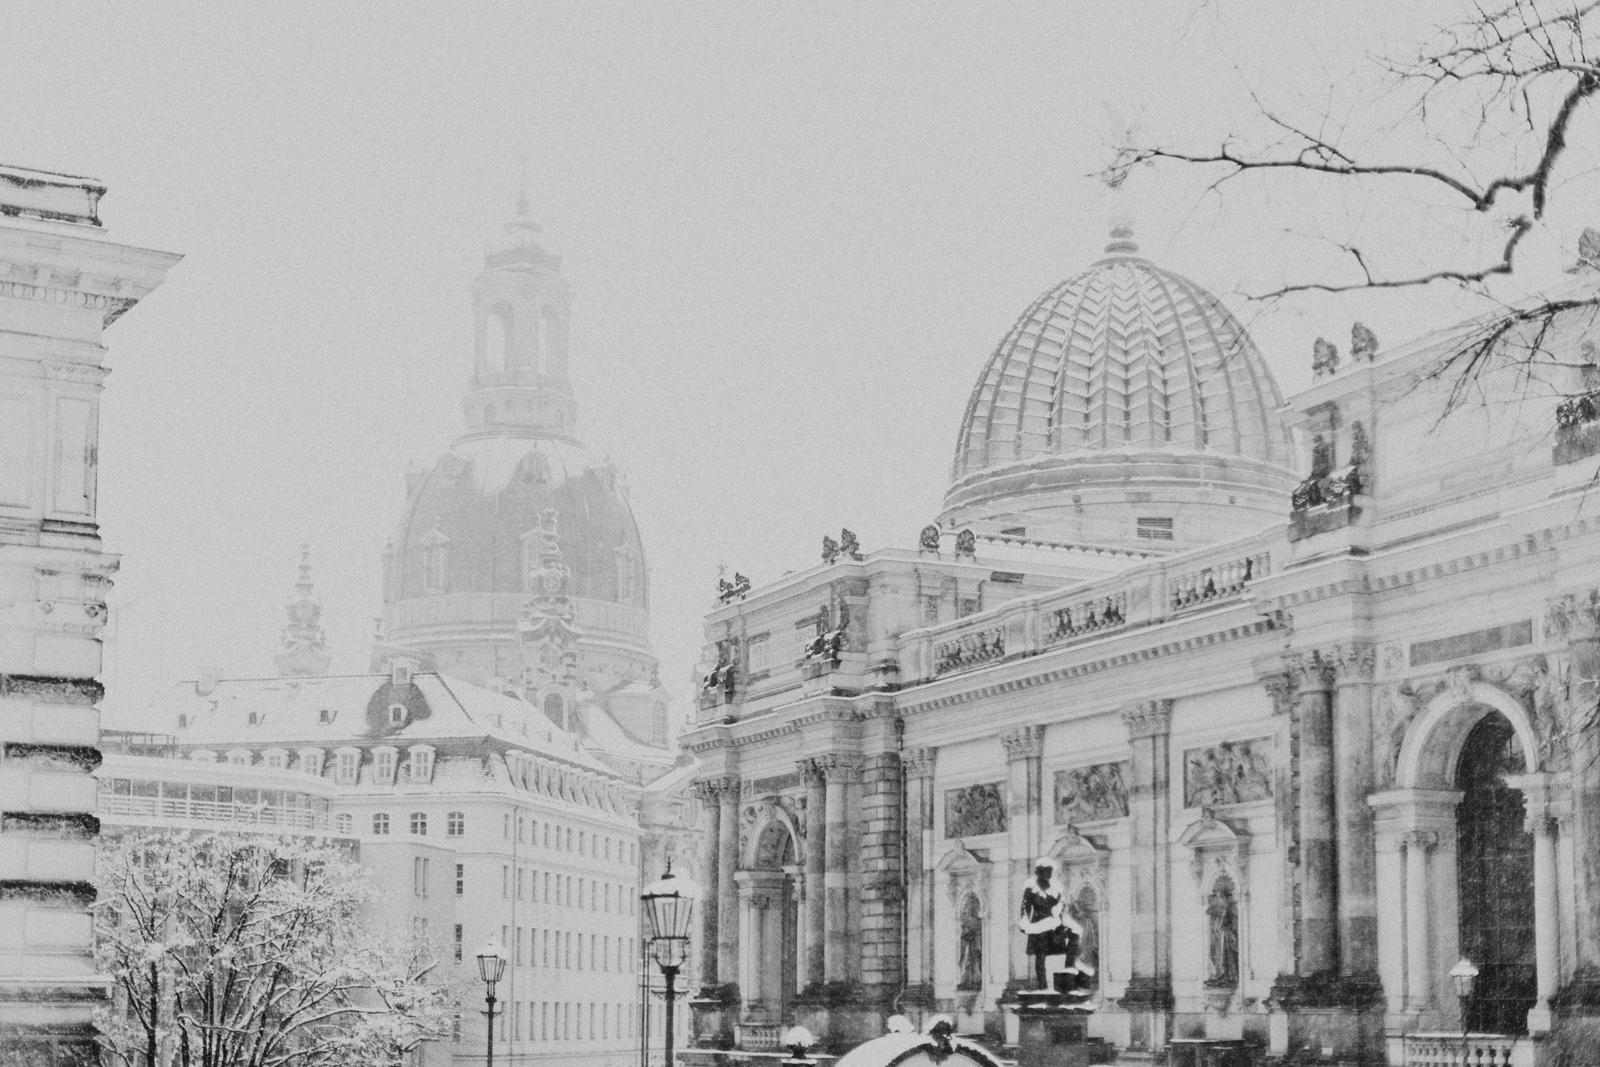 Winterspaziergang durch die Dresdner Altstadt 2019